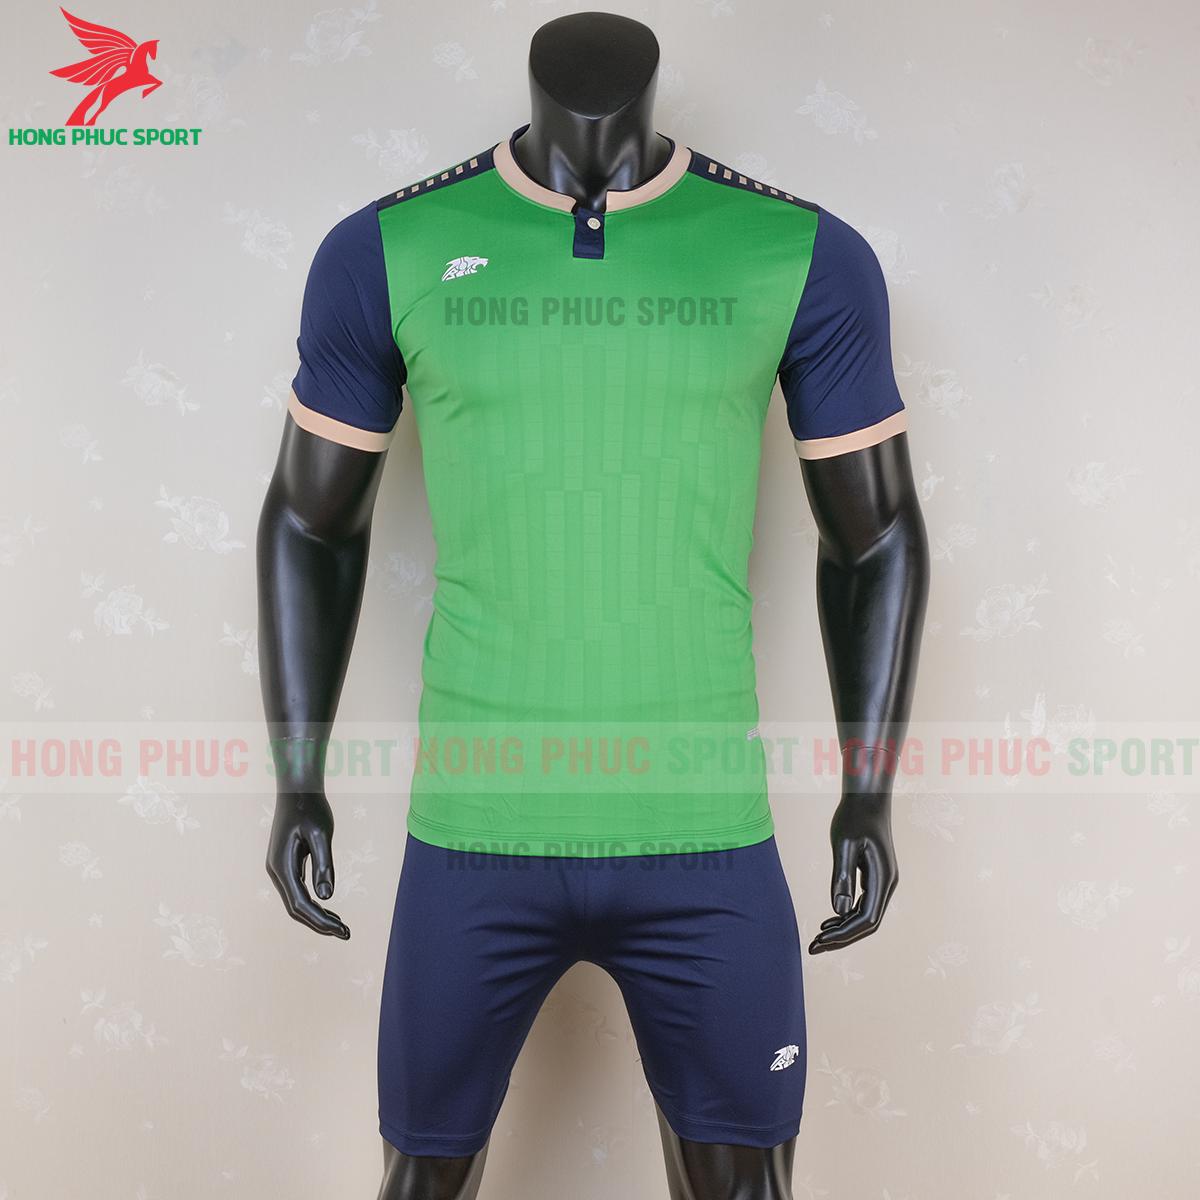 https://cdn.hongphucsport.com/unsafe/s4.shopbay.vn/files/285/ao-bong-da-khong-logo-riki-neck-xanh-la-cay-6-5f71aa96a173e.png